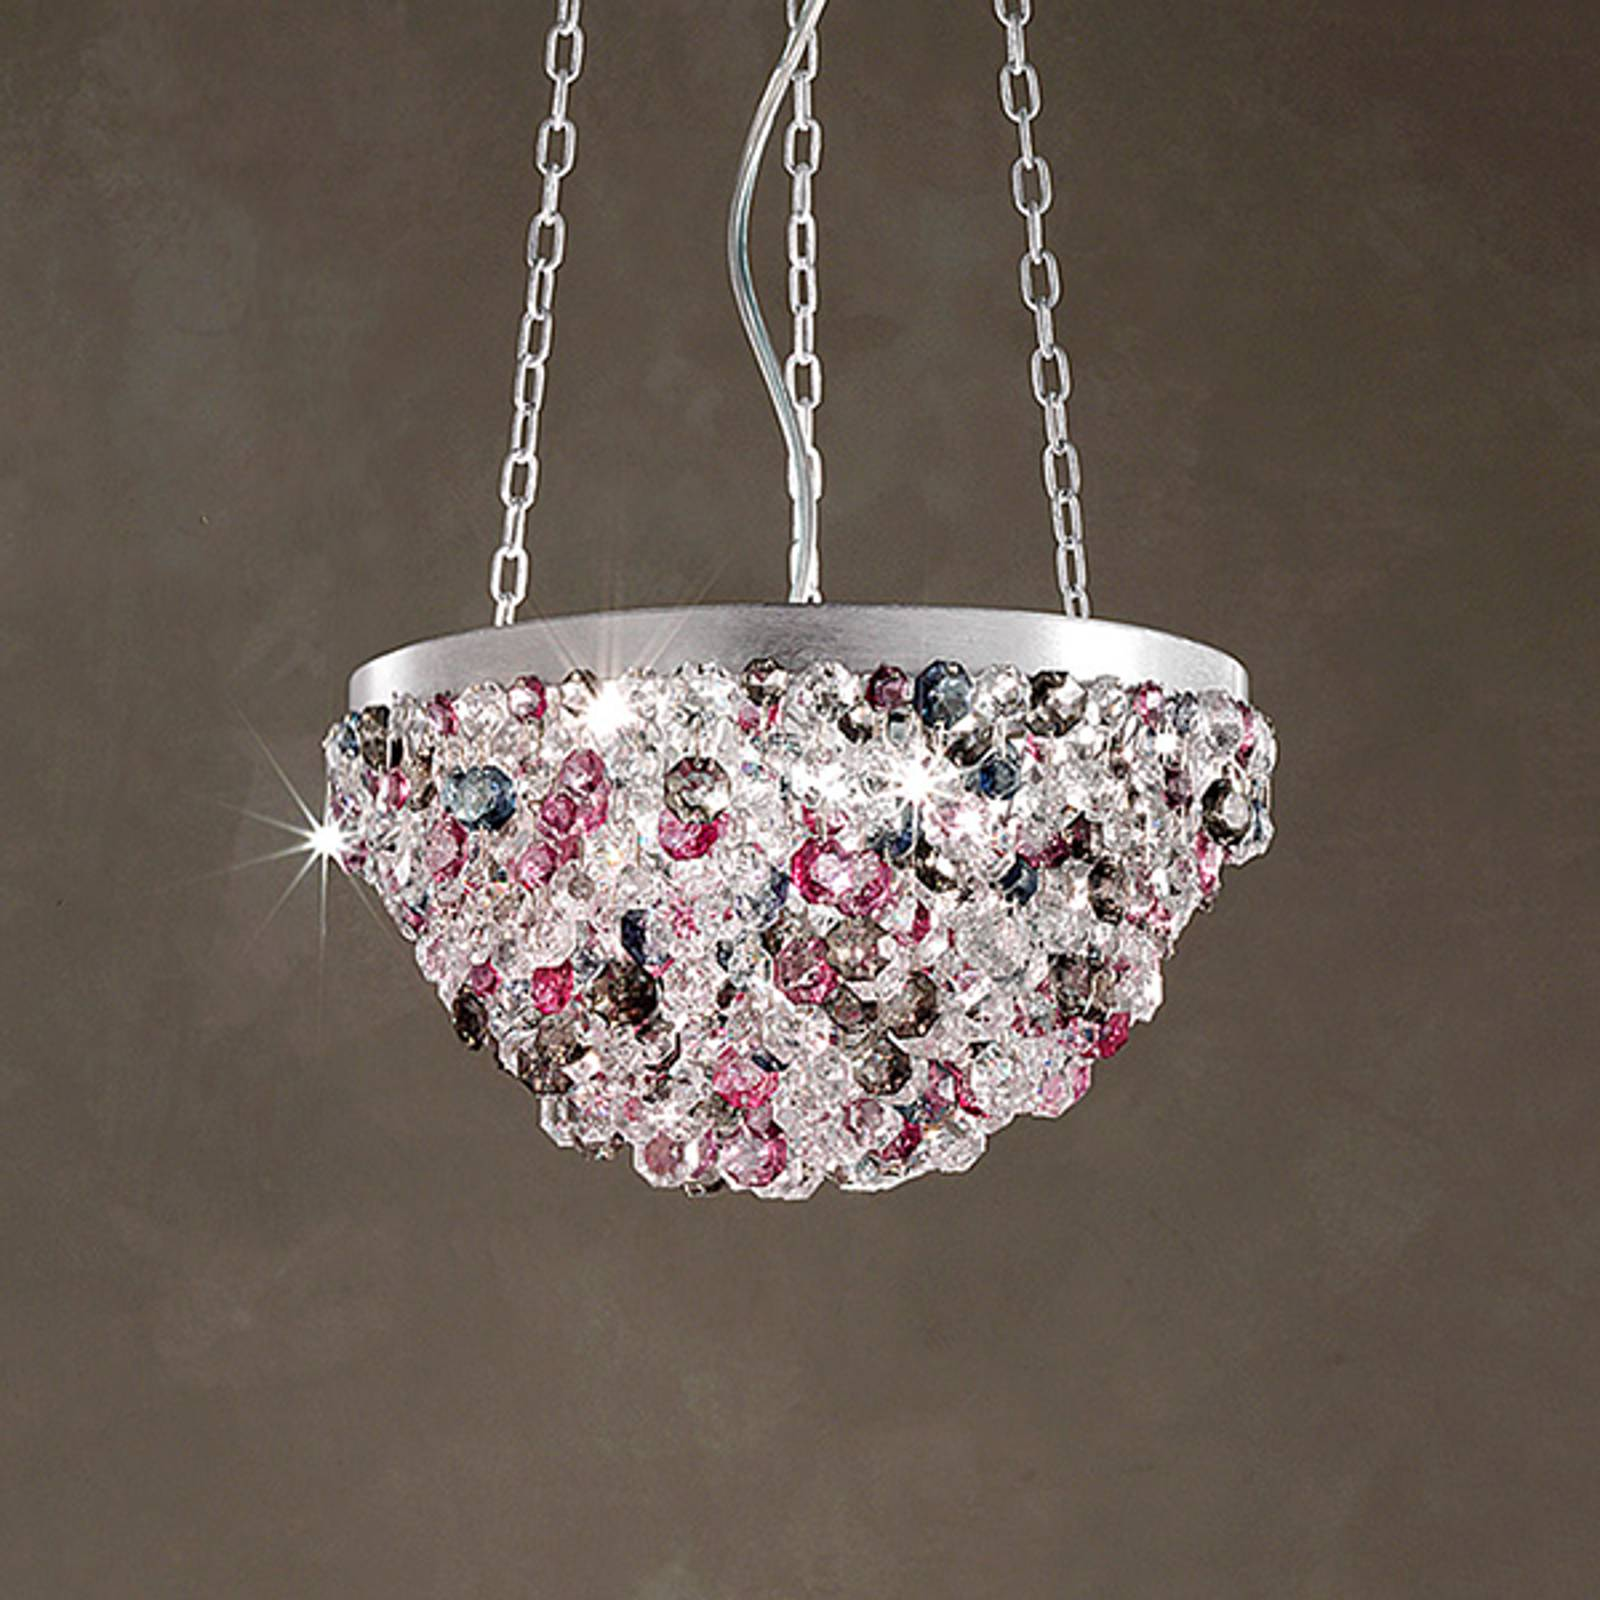 Halfbolvormige hanglamp Rosemery